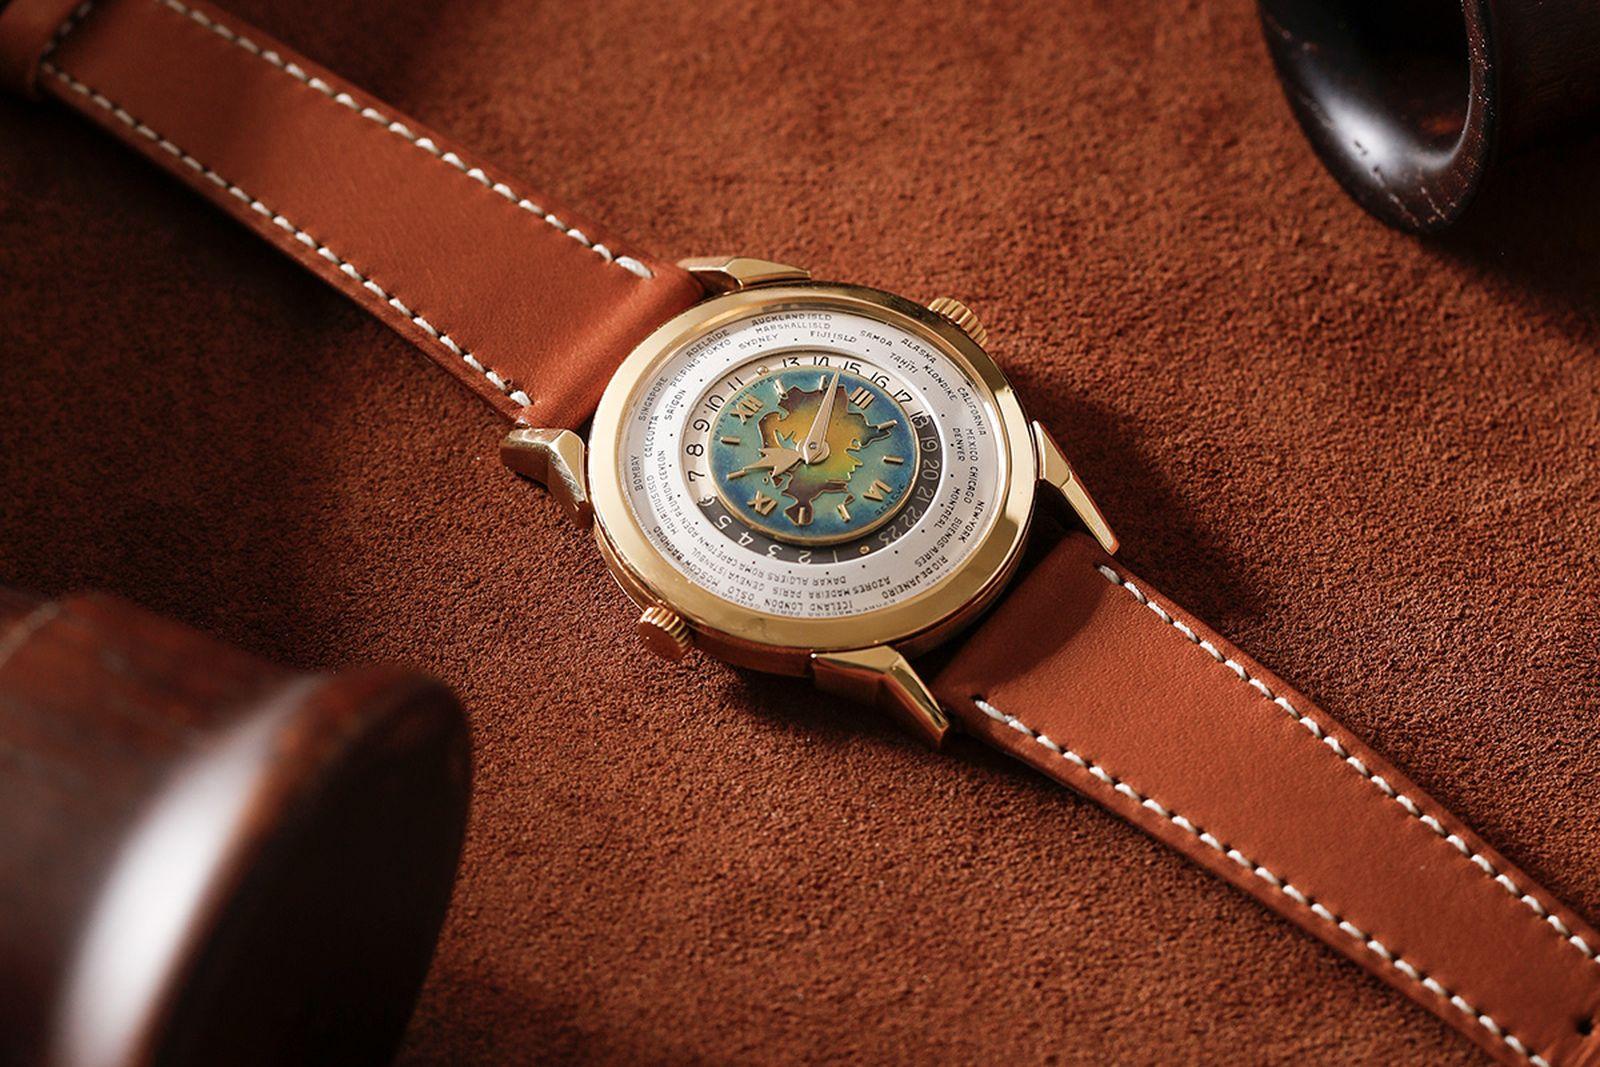 phillips-geneva-watch-auction-xiii-04